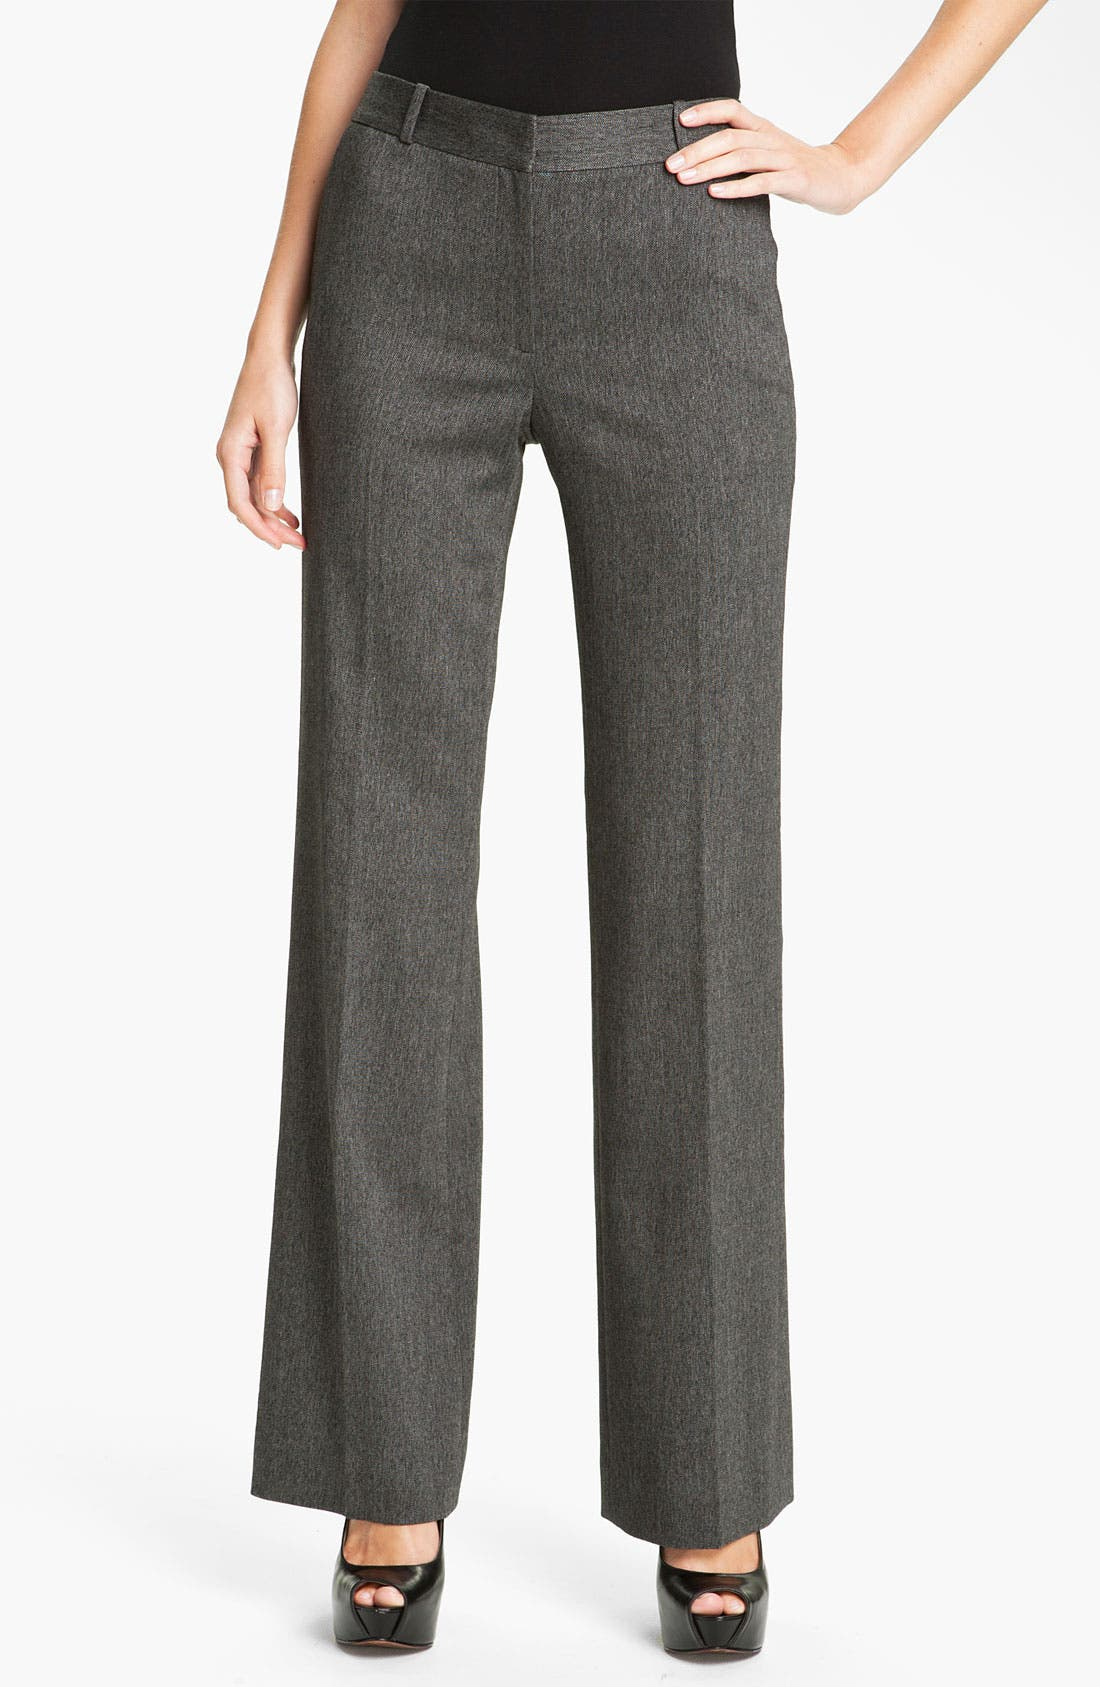 Alternate Image 1 Selected - Classiques Entier® 'Nevica Weave' Pants